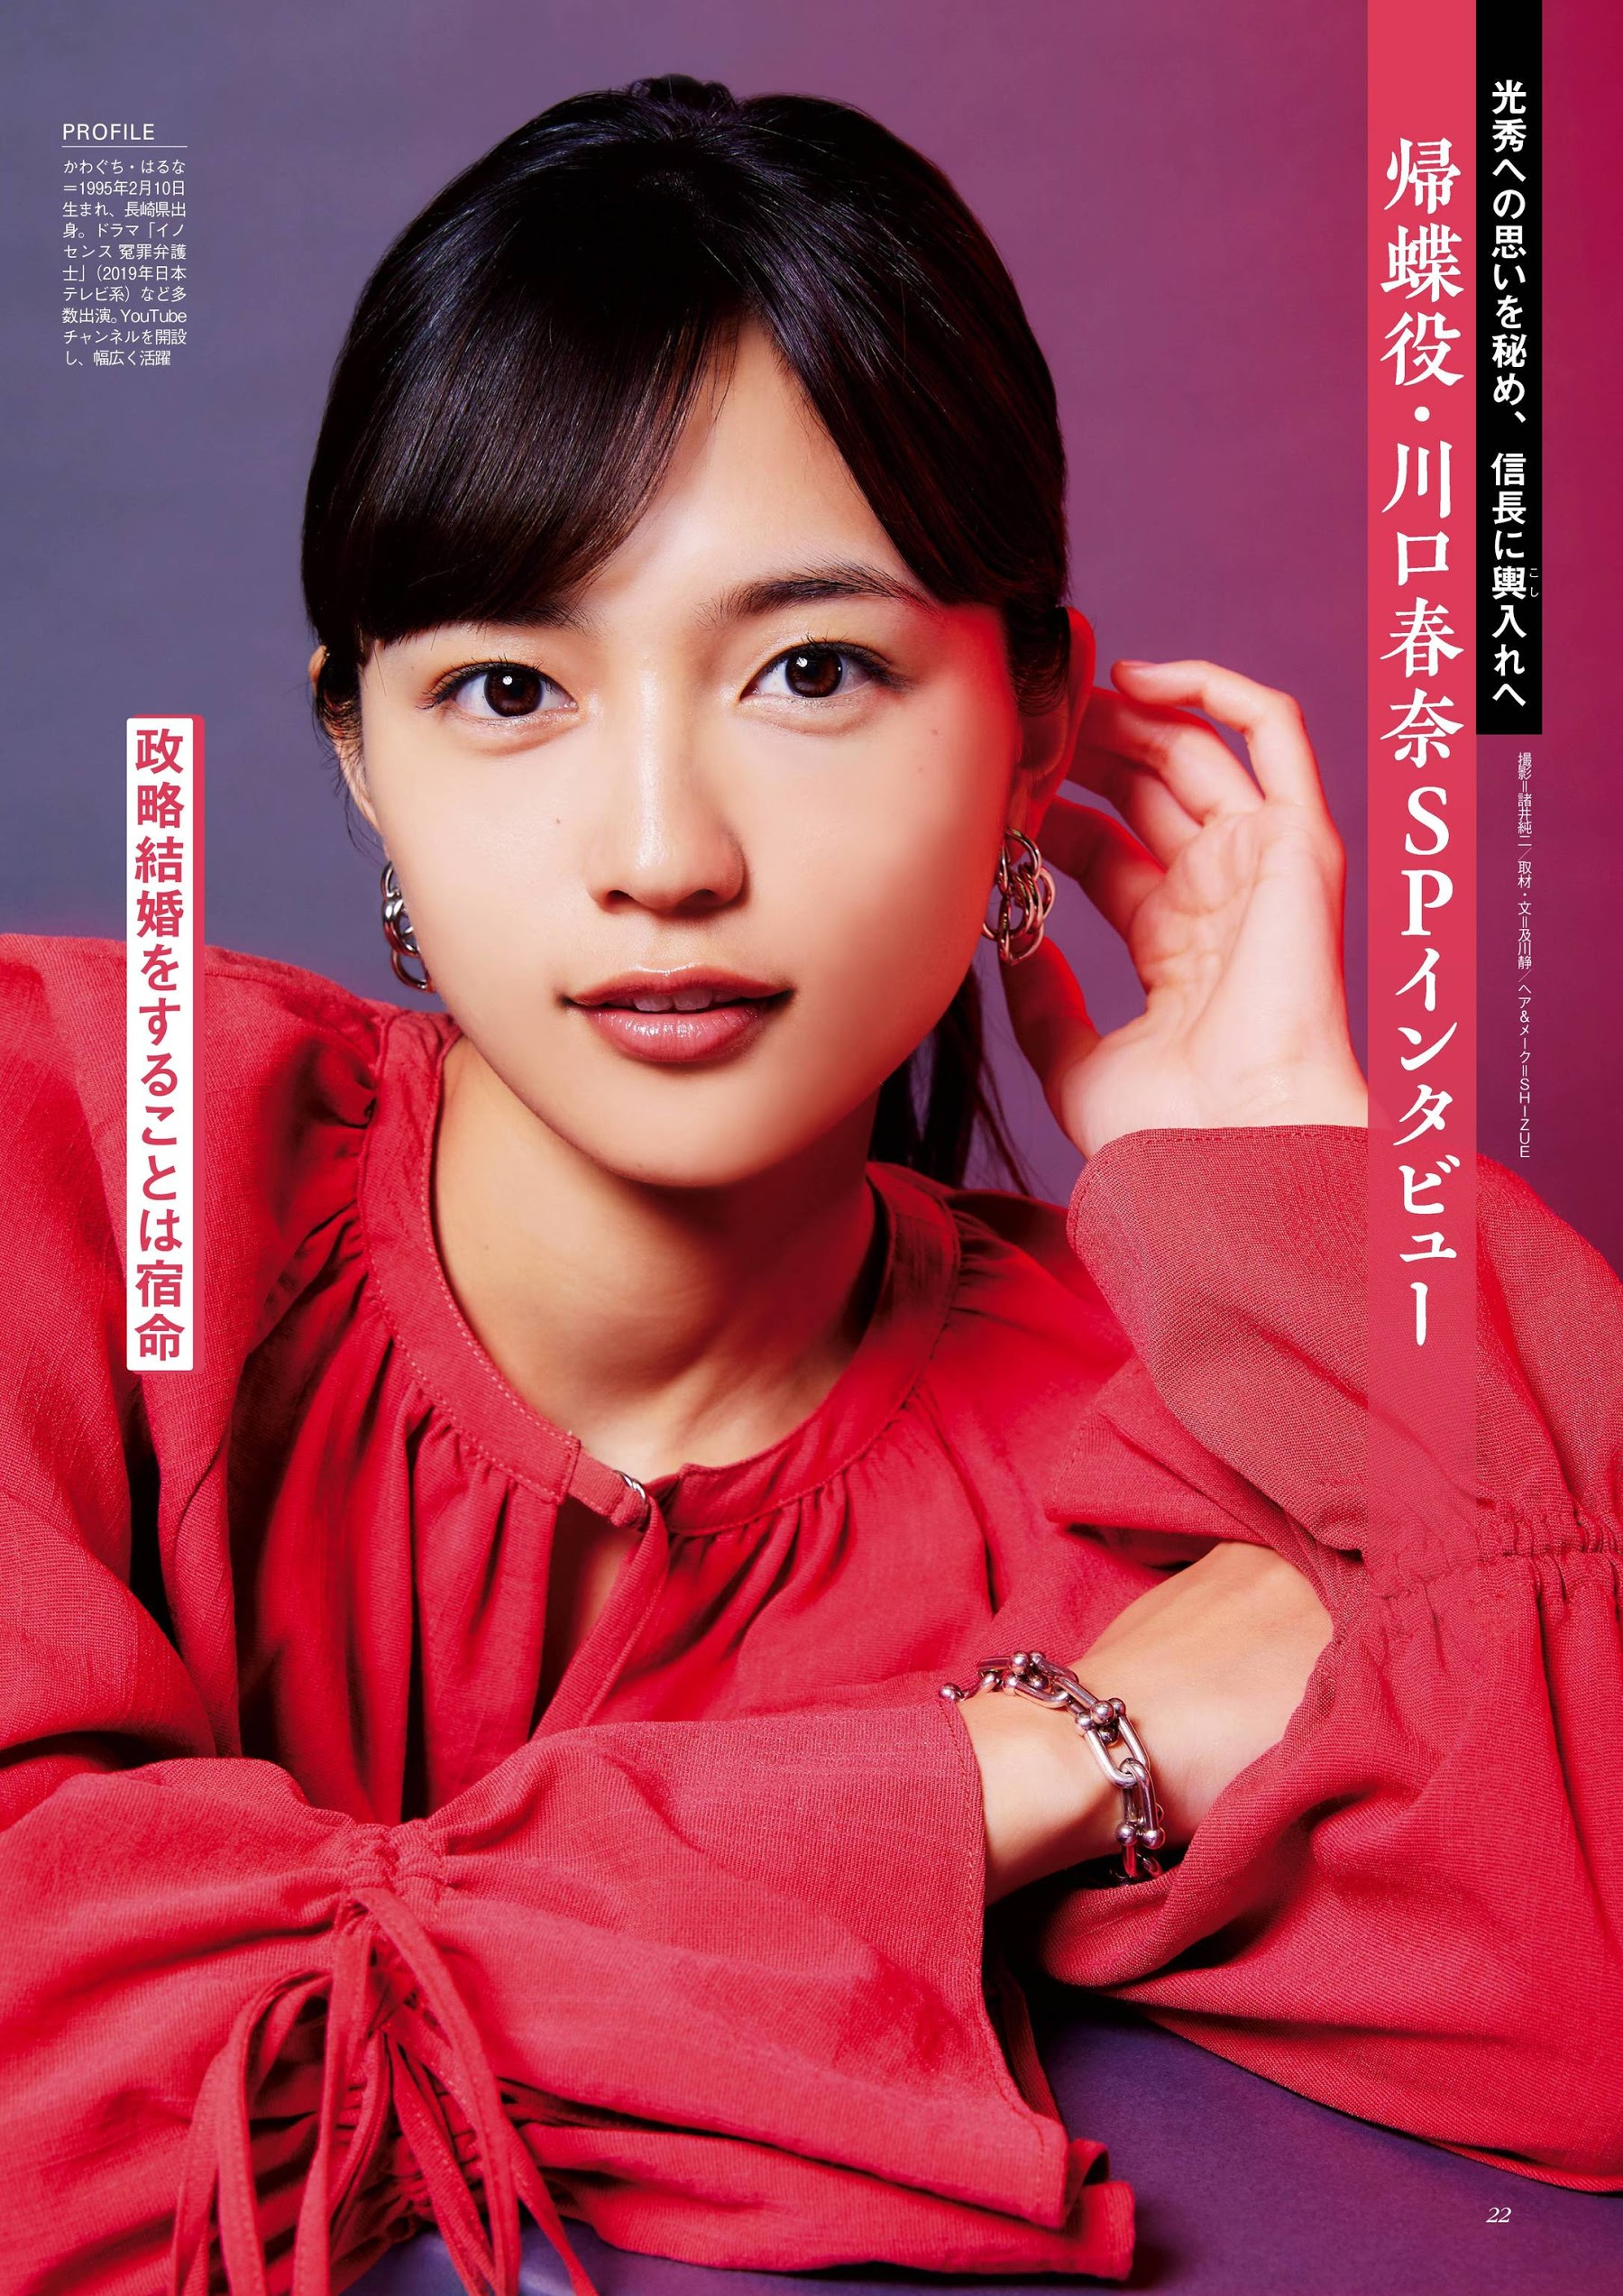 THETV 2020.03.13 NO.11 川口春奈